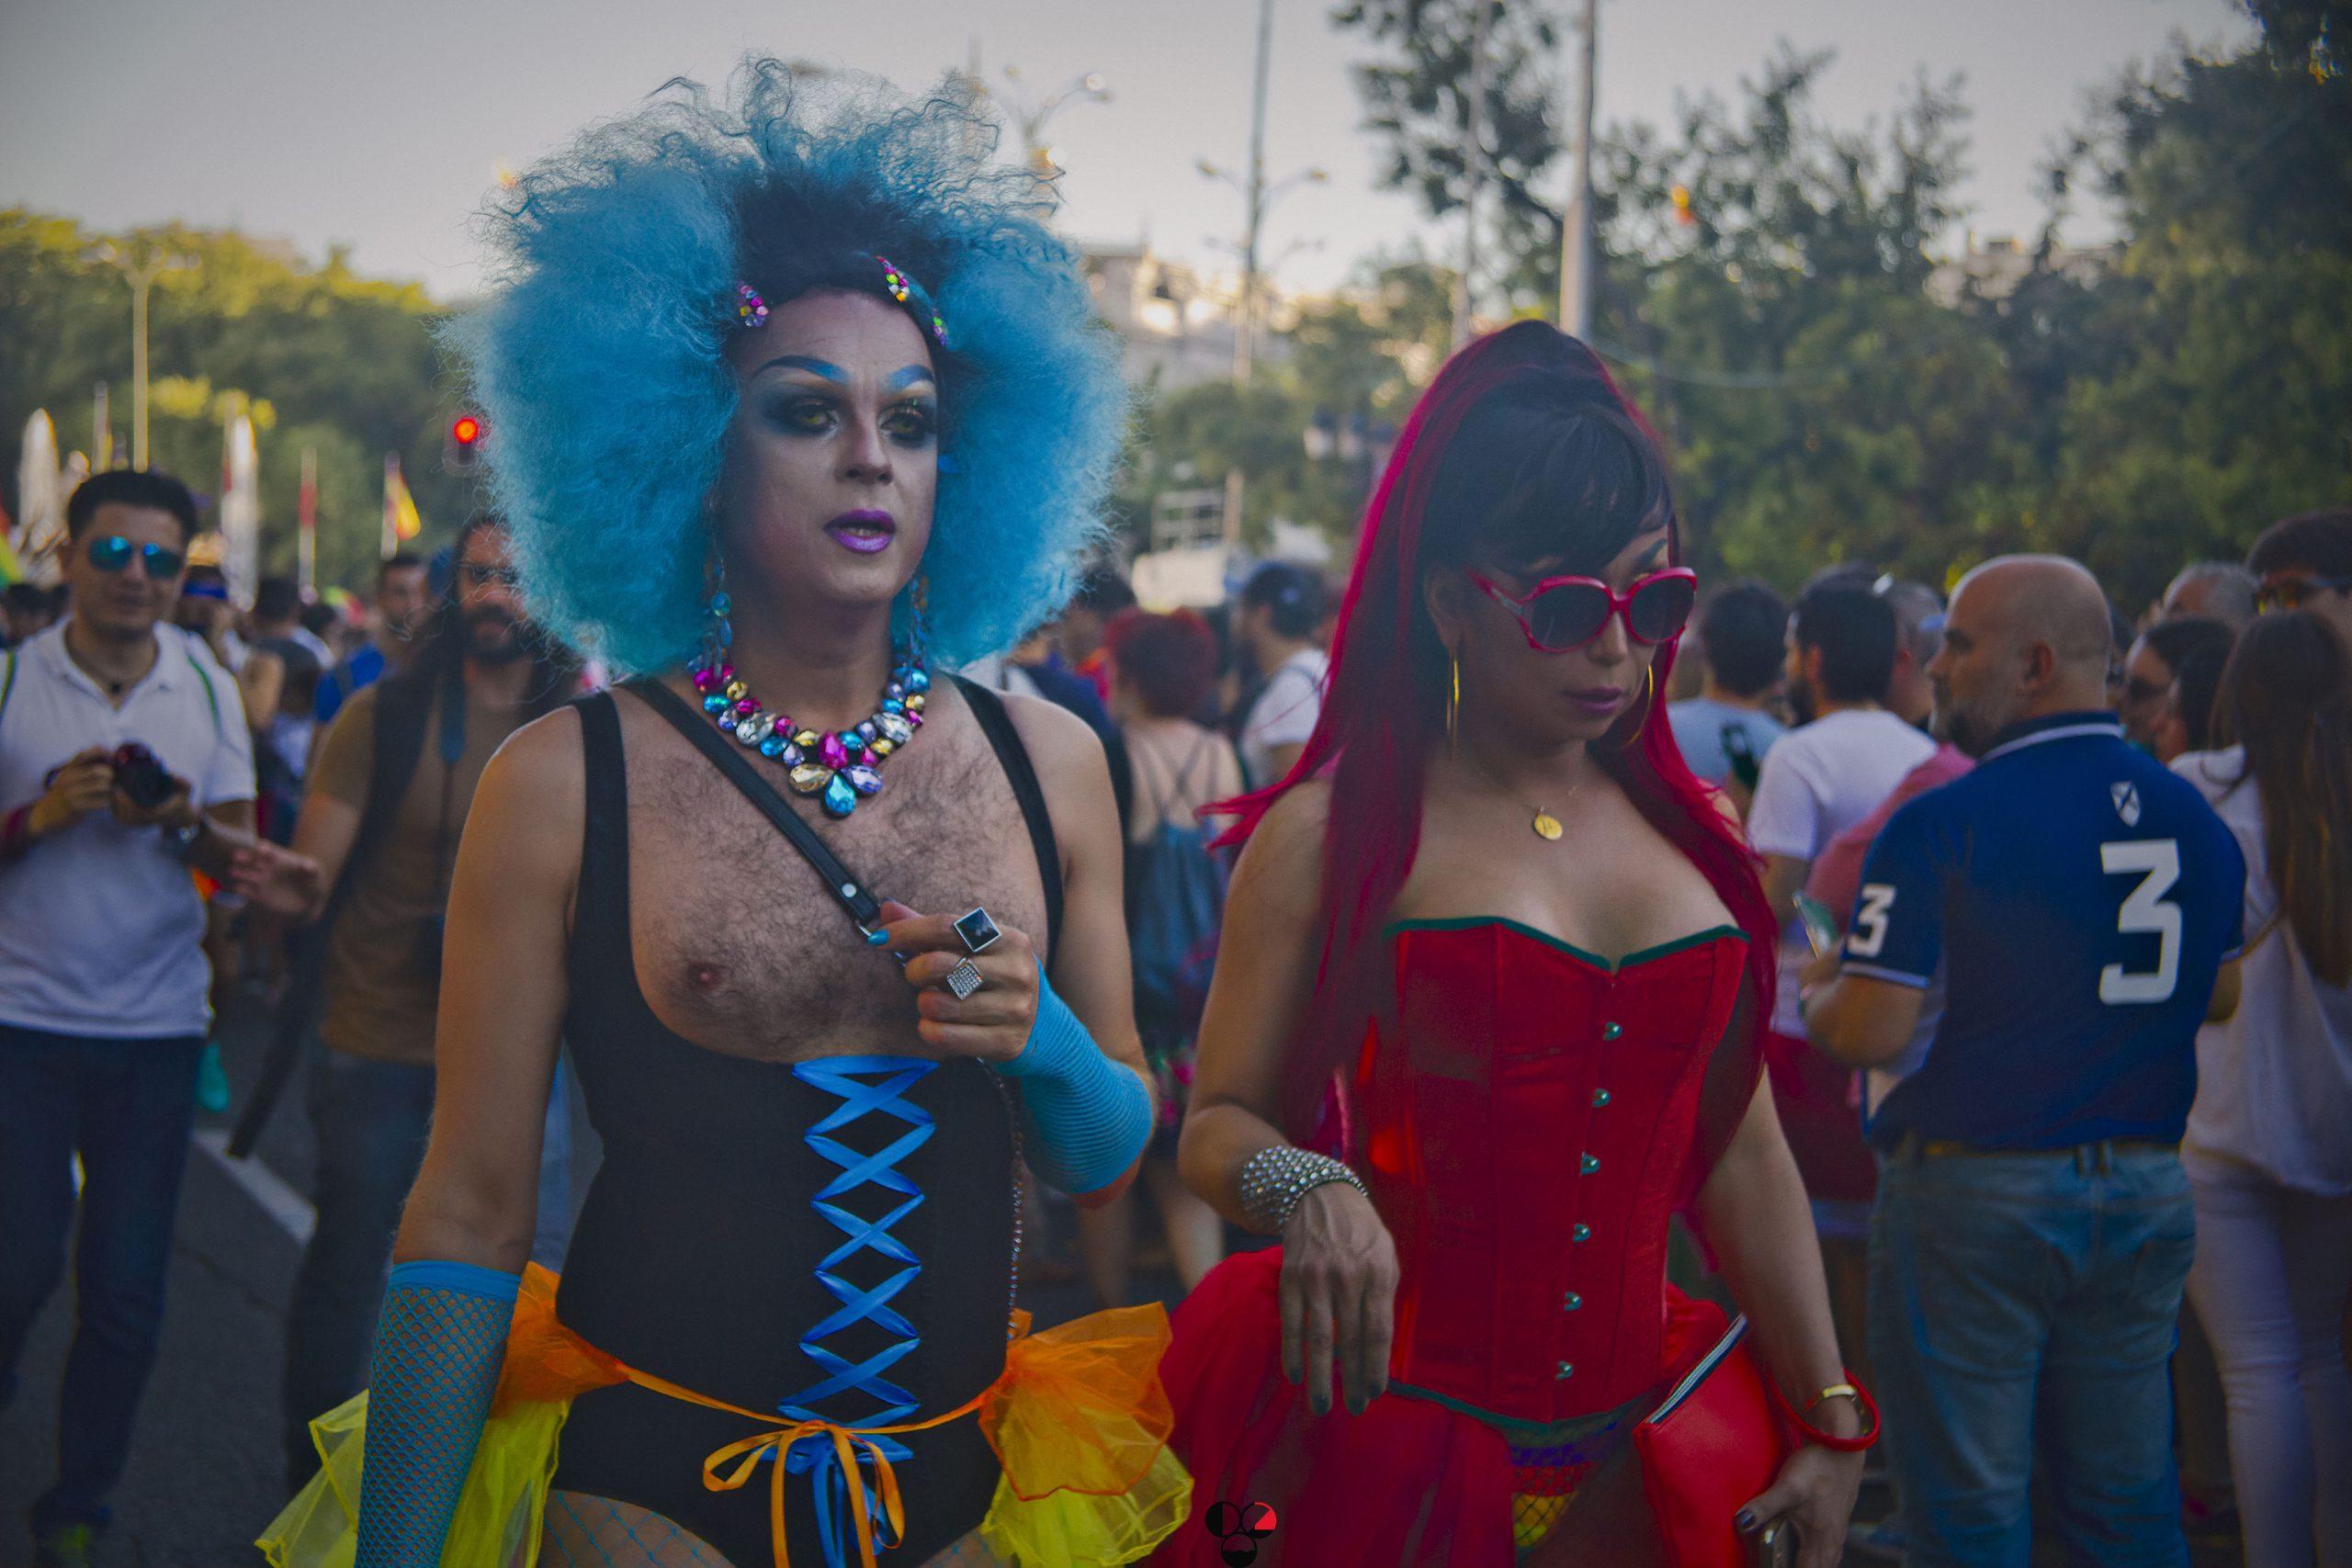 world pride Madrid 2017 6 croma climax